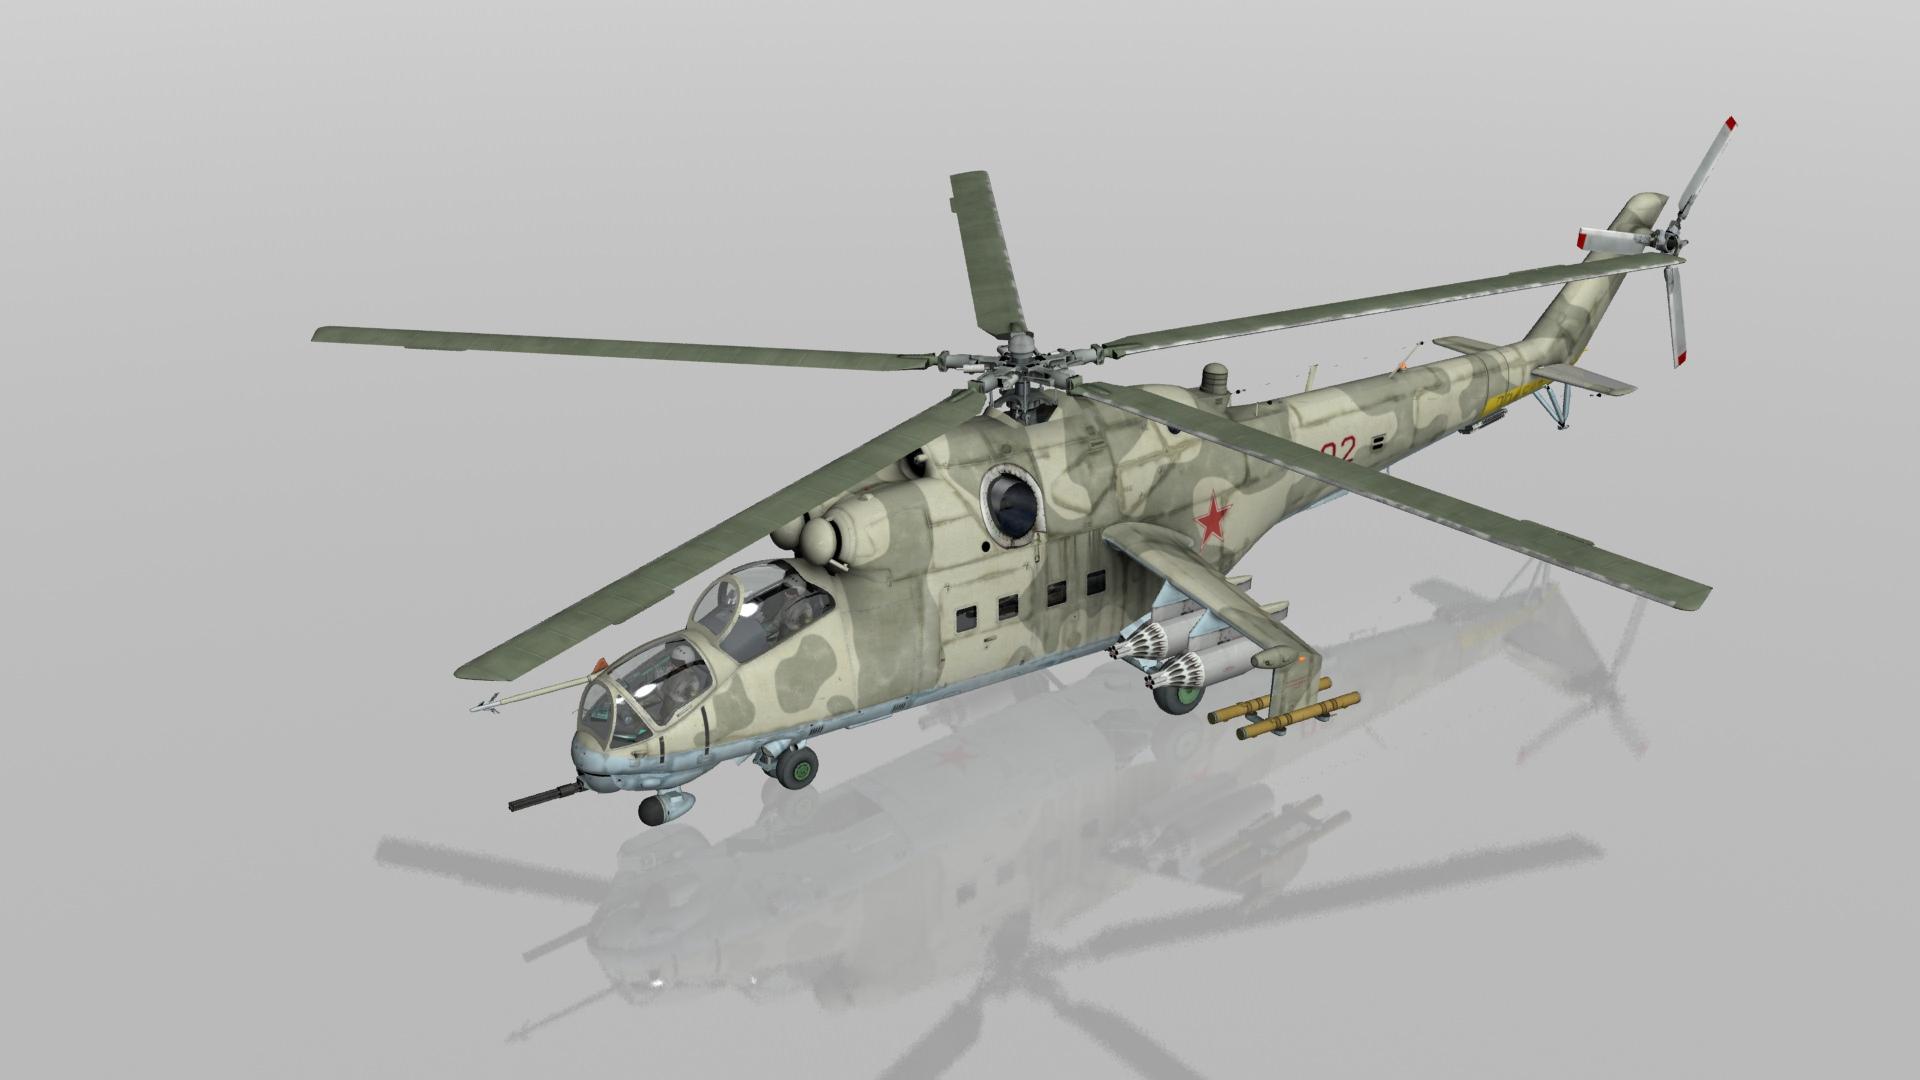 Mi24 Hind Russian Helicopter Gunship 3D Model Game ready  : mi24hindrussianhelicoptergunship3dmodel3dsfbxc4dlwolwlwsmambobjmax4564a21e 6006 4ec9 820a 36358ce9dcf5 from www.cgtrader.com size 1920 x 1080 jpeg 194kB